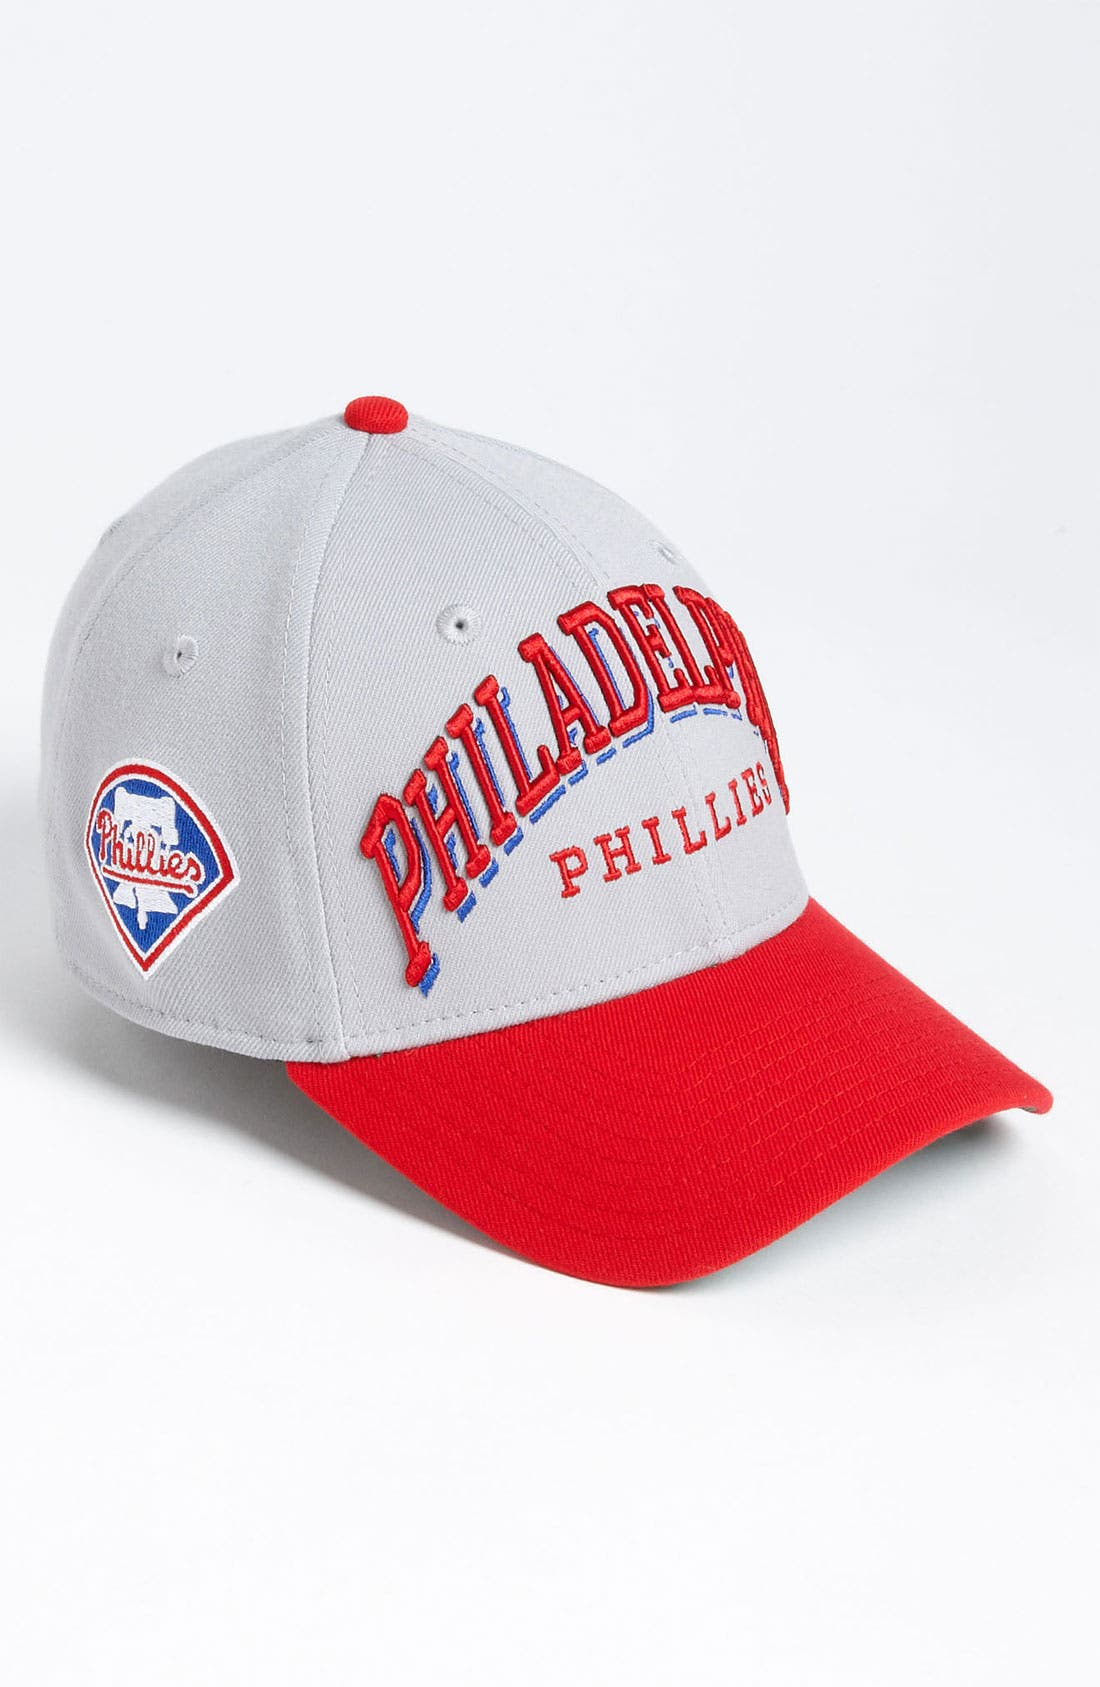 Alternate Image 2  - New Era Cap 'Philadelphia Phillies - Arch Mark' Fitted Baseball Cap